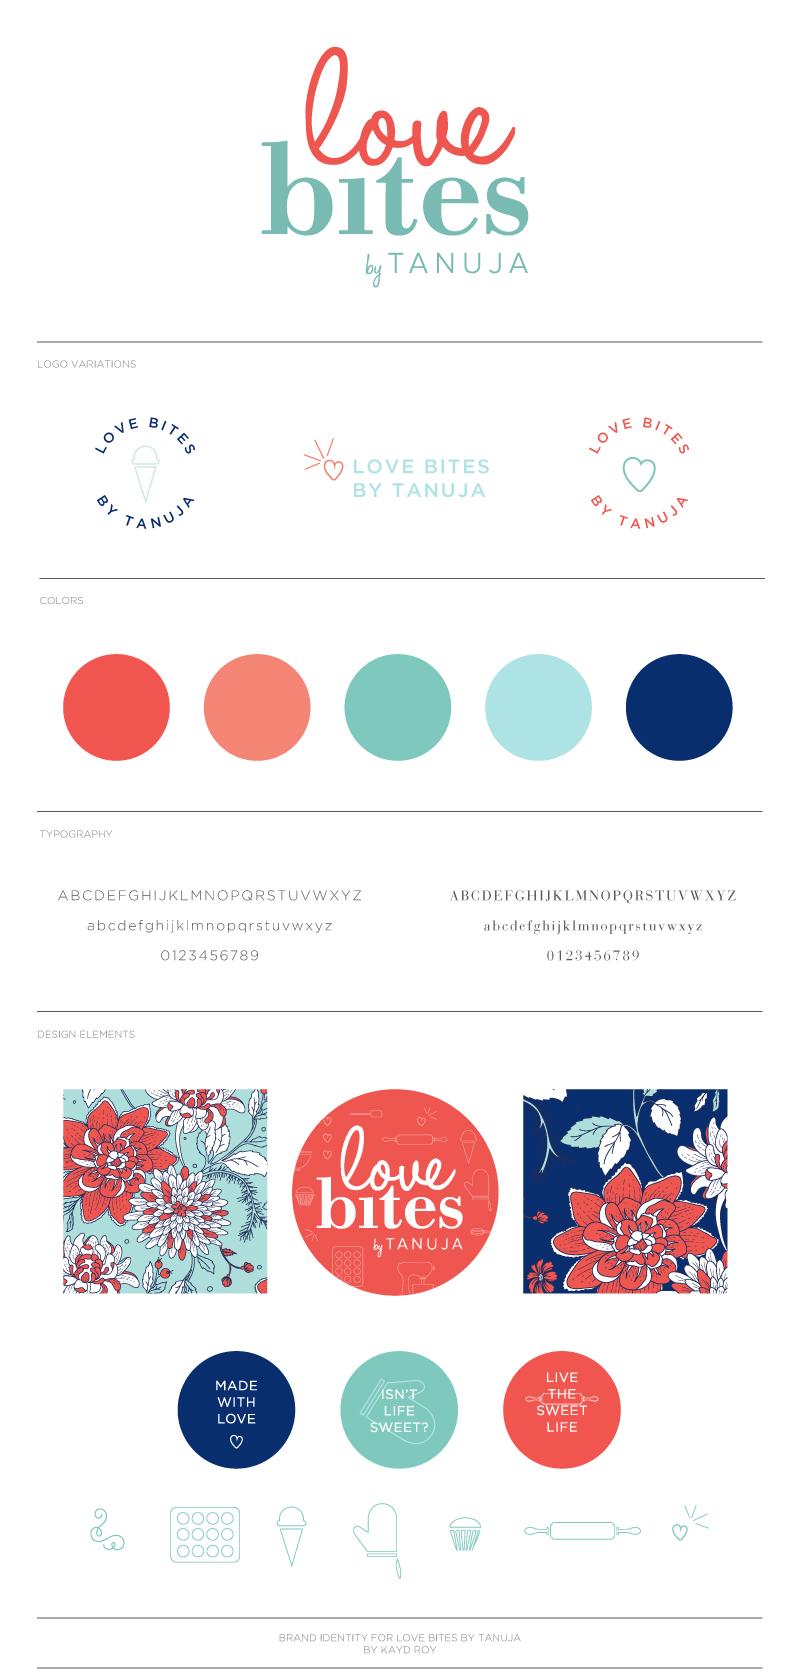 Branding for Love Bites by Tanuja  -  Kayd Roy